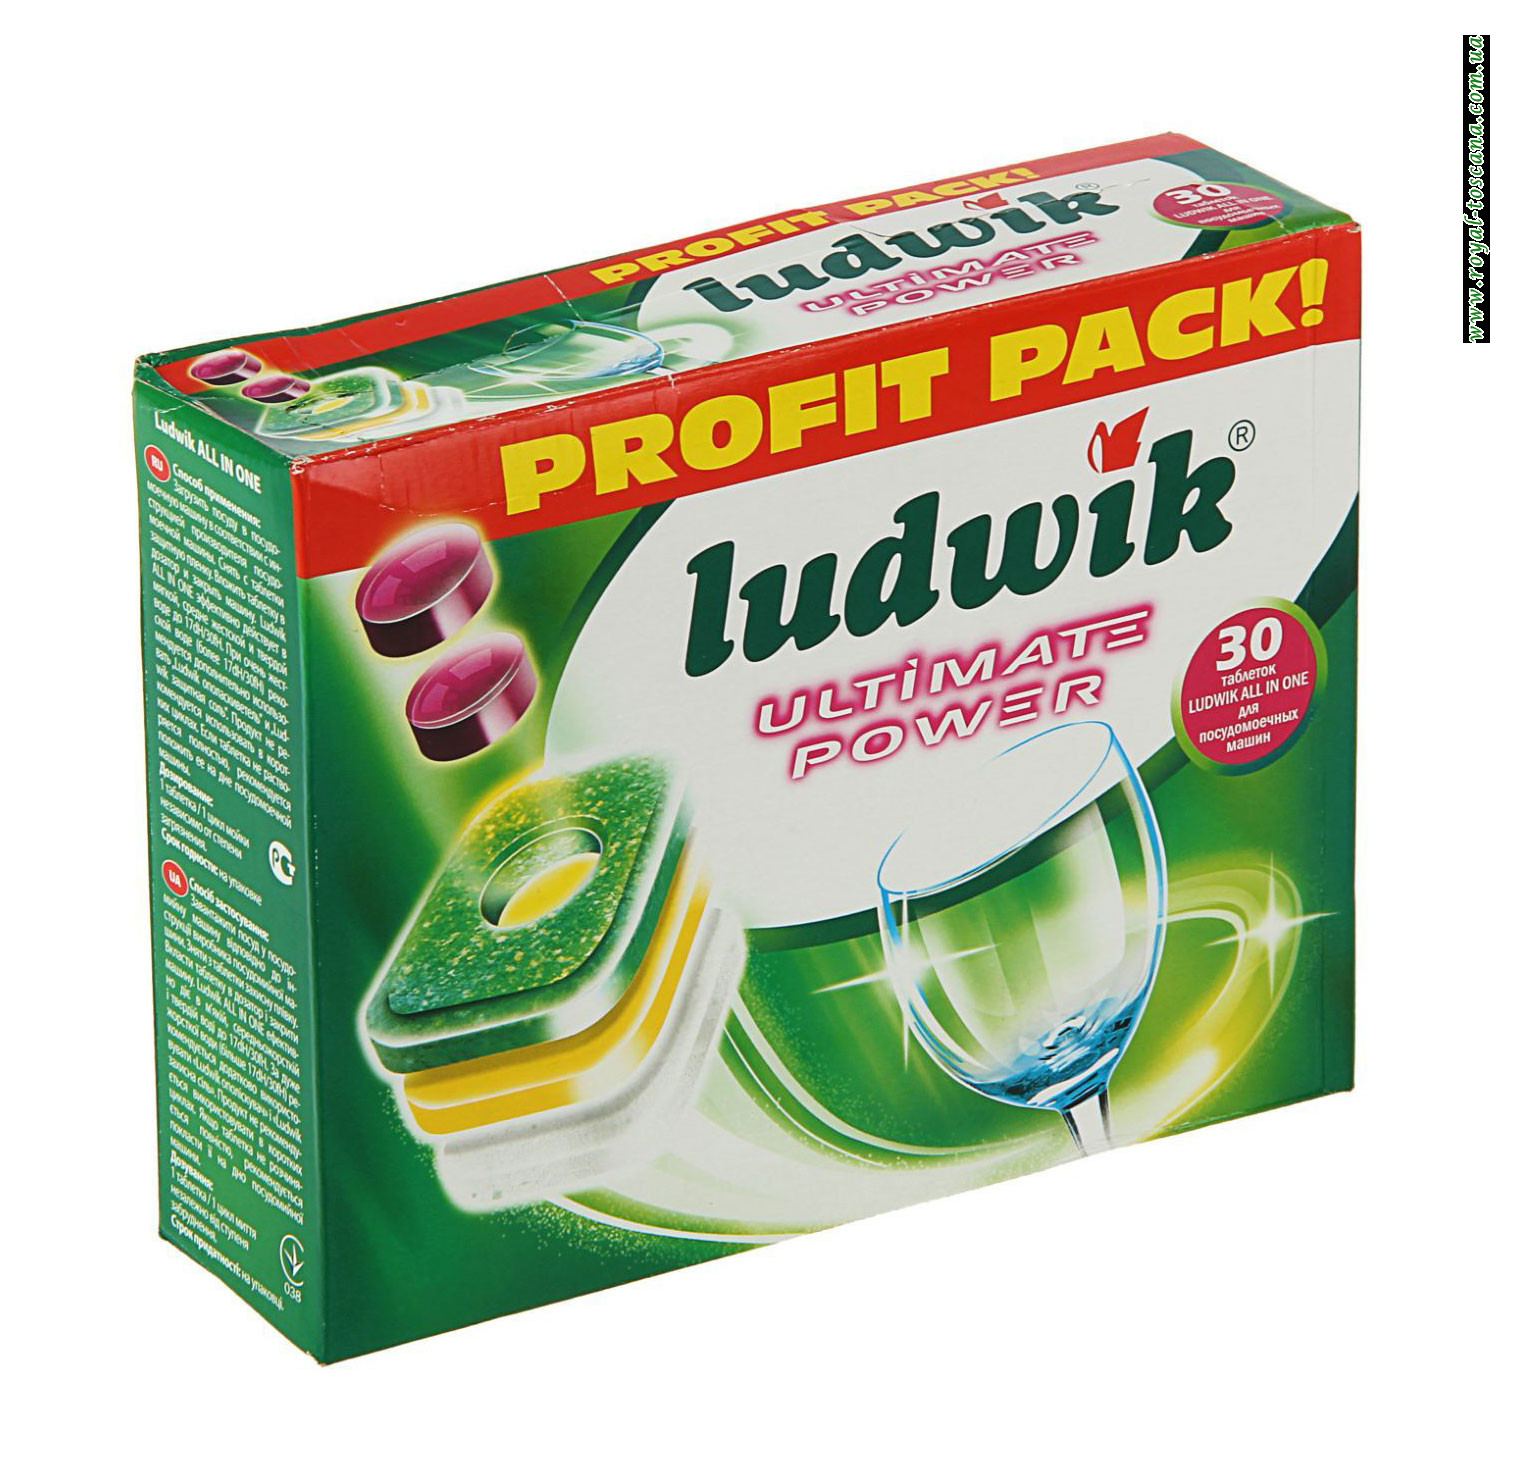 Таблетки для посудомоечных машин Ludwik Ultimate Power All in One, 30 шт